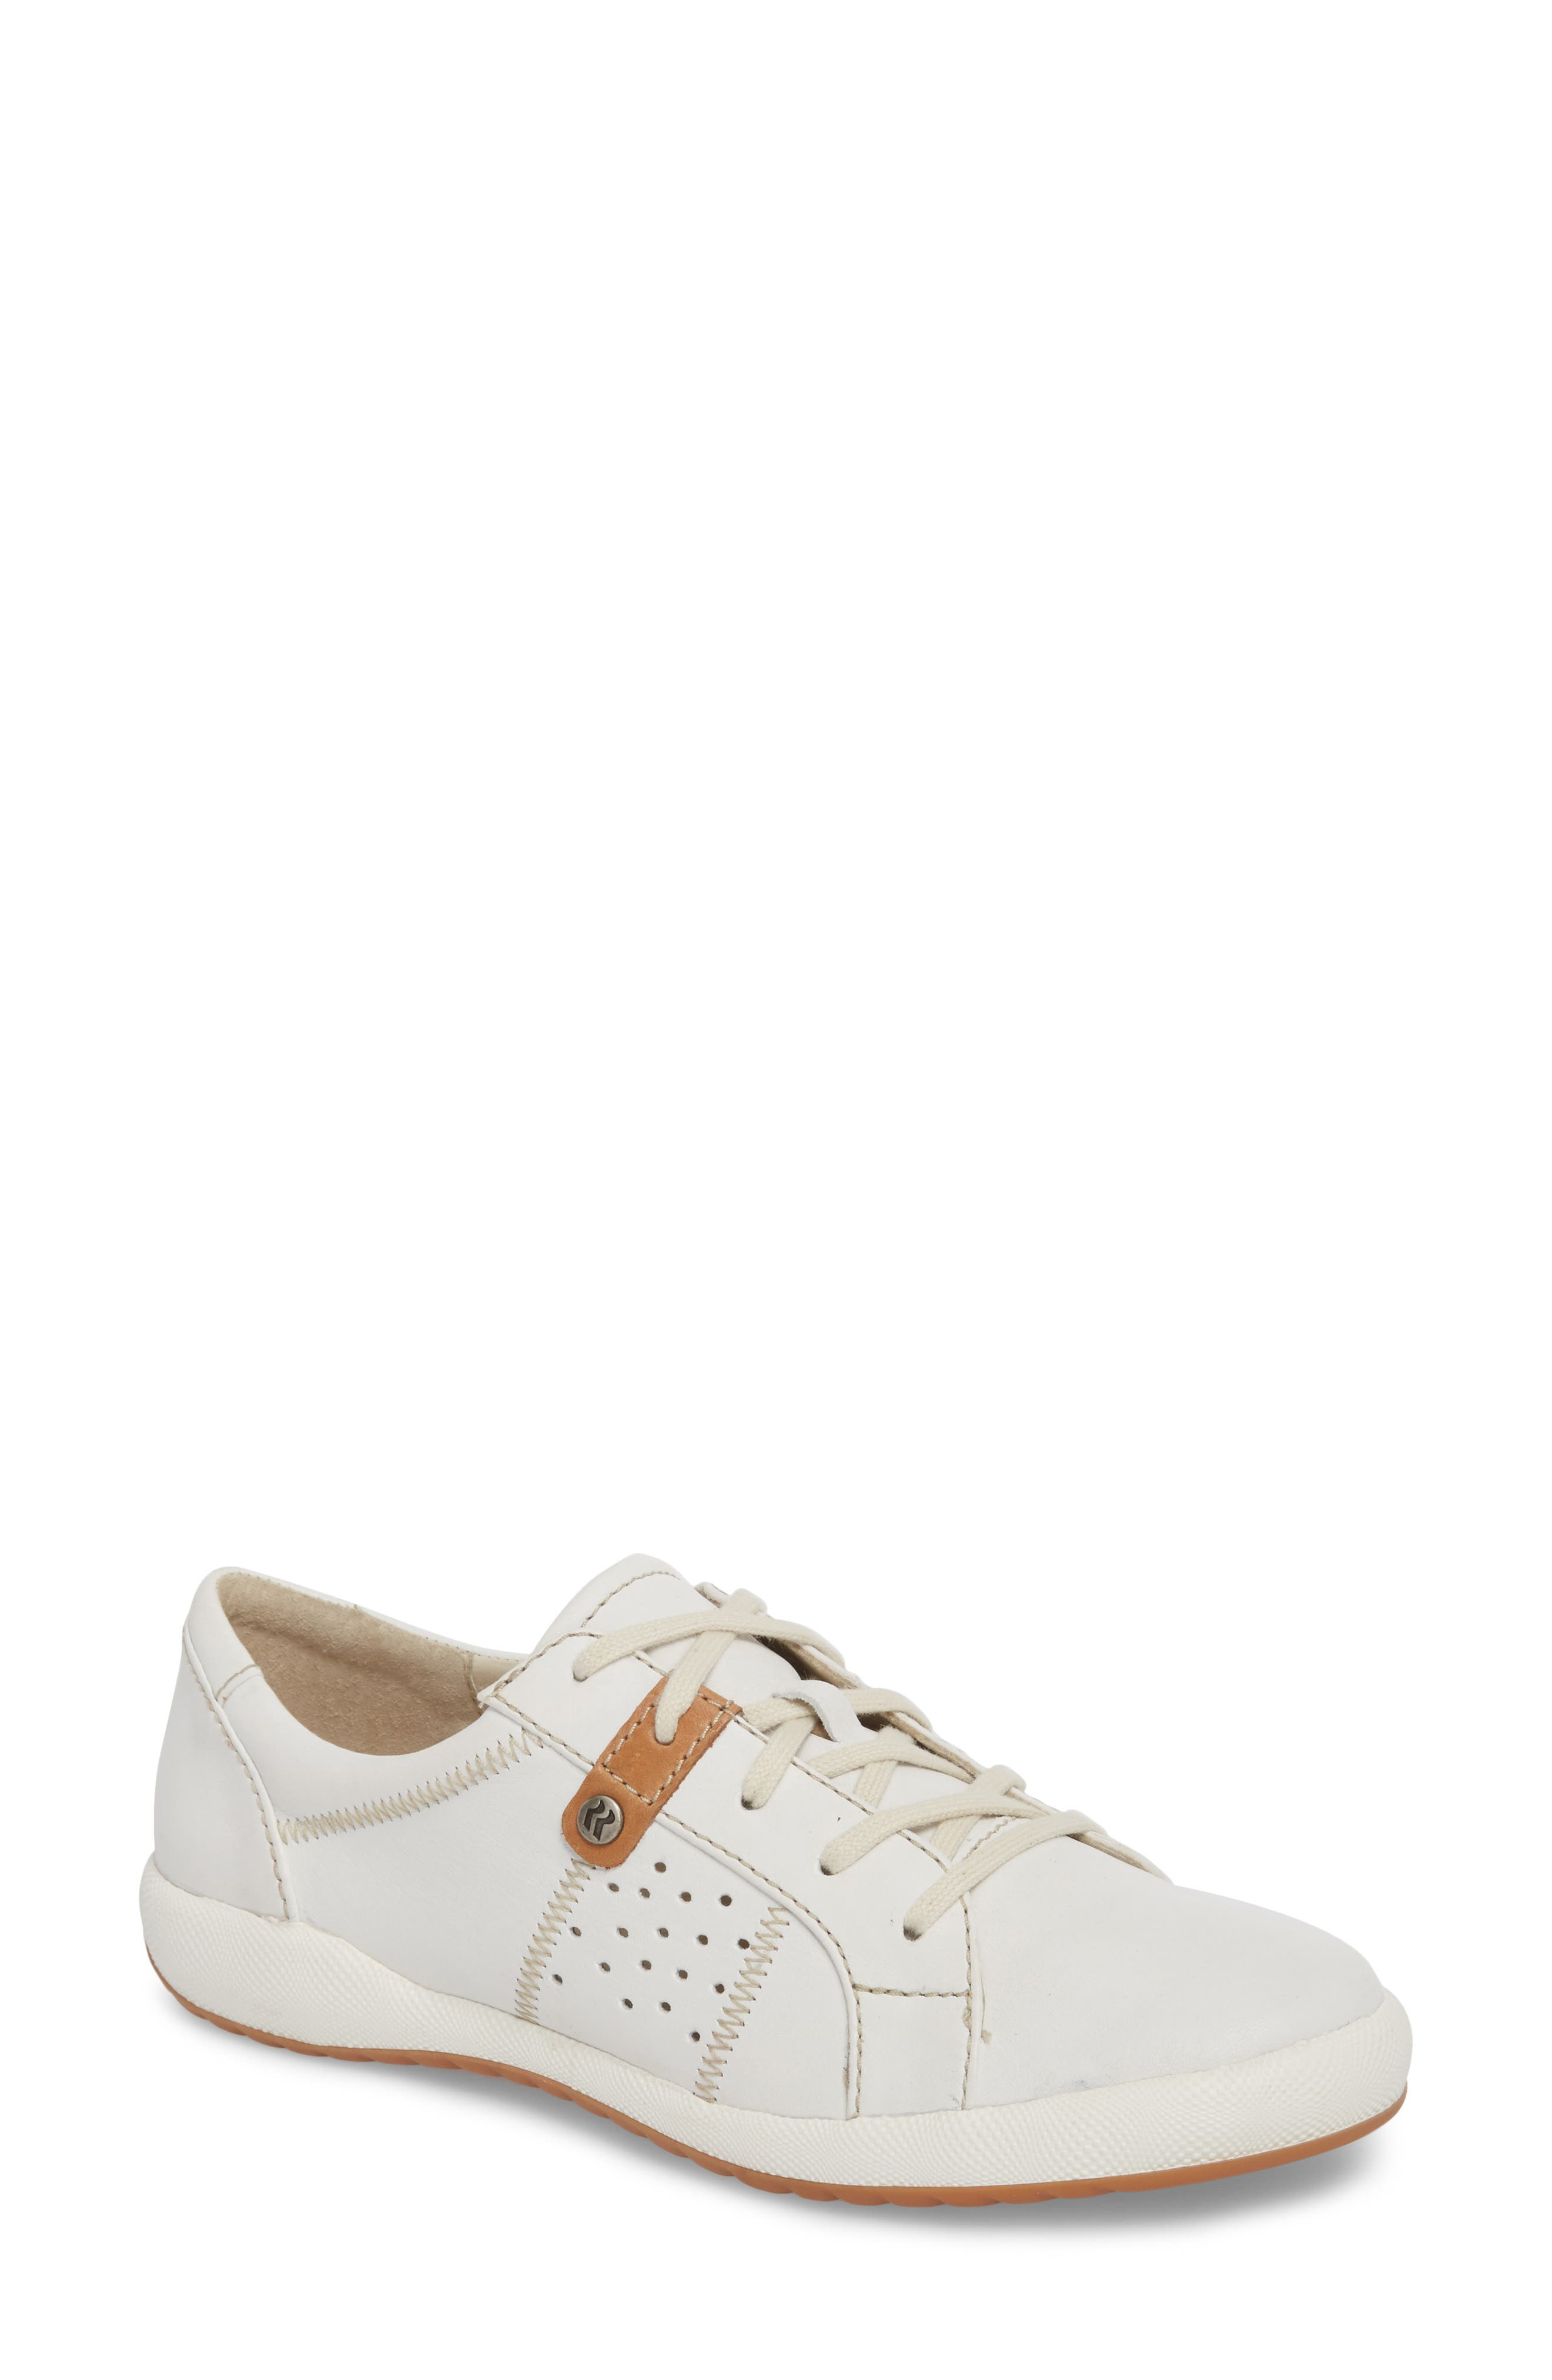 Cordoba 01 Sneaker,                             Main thumbnail 1, color,                             WHITE LEATHER